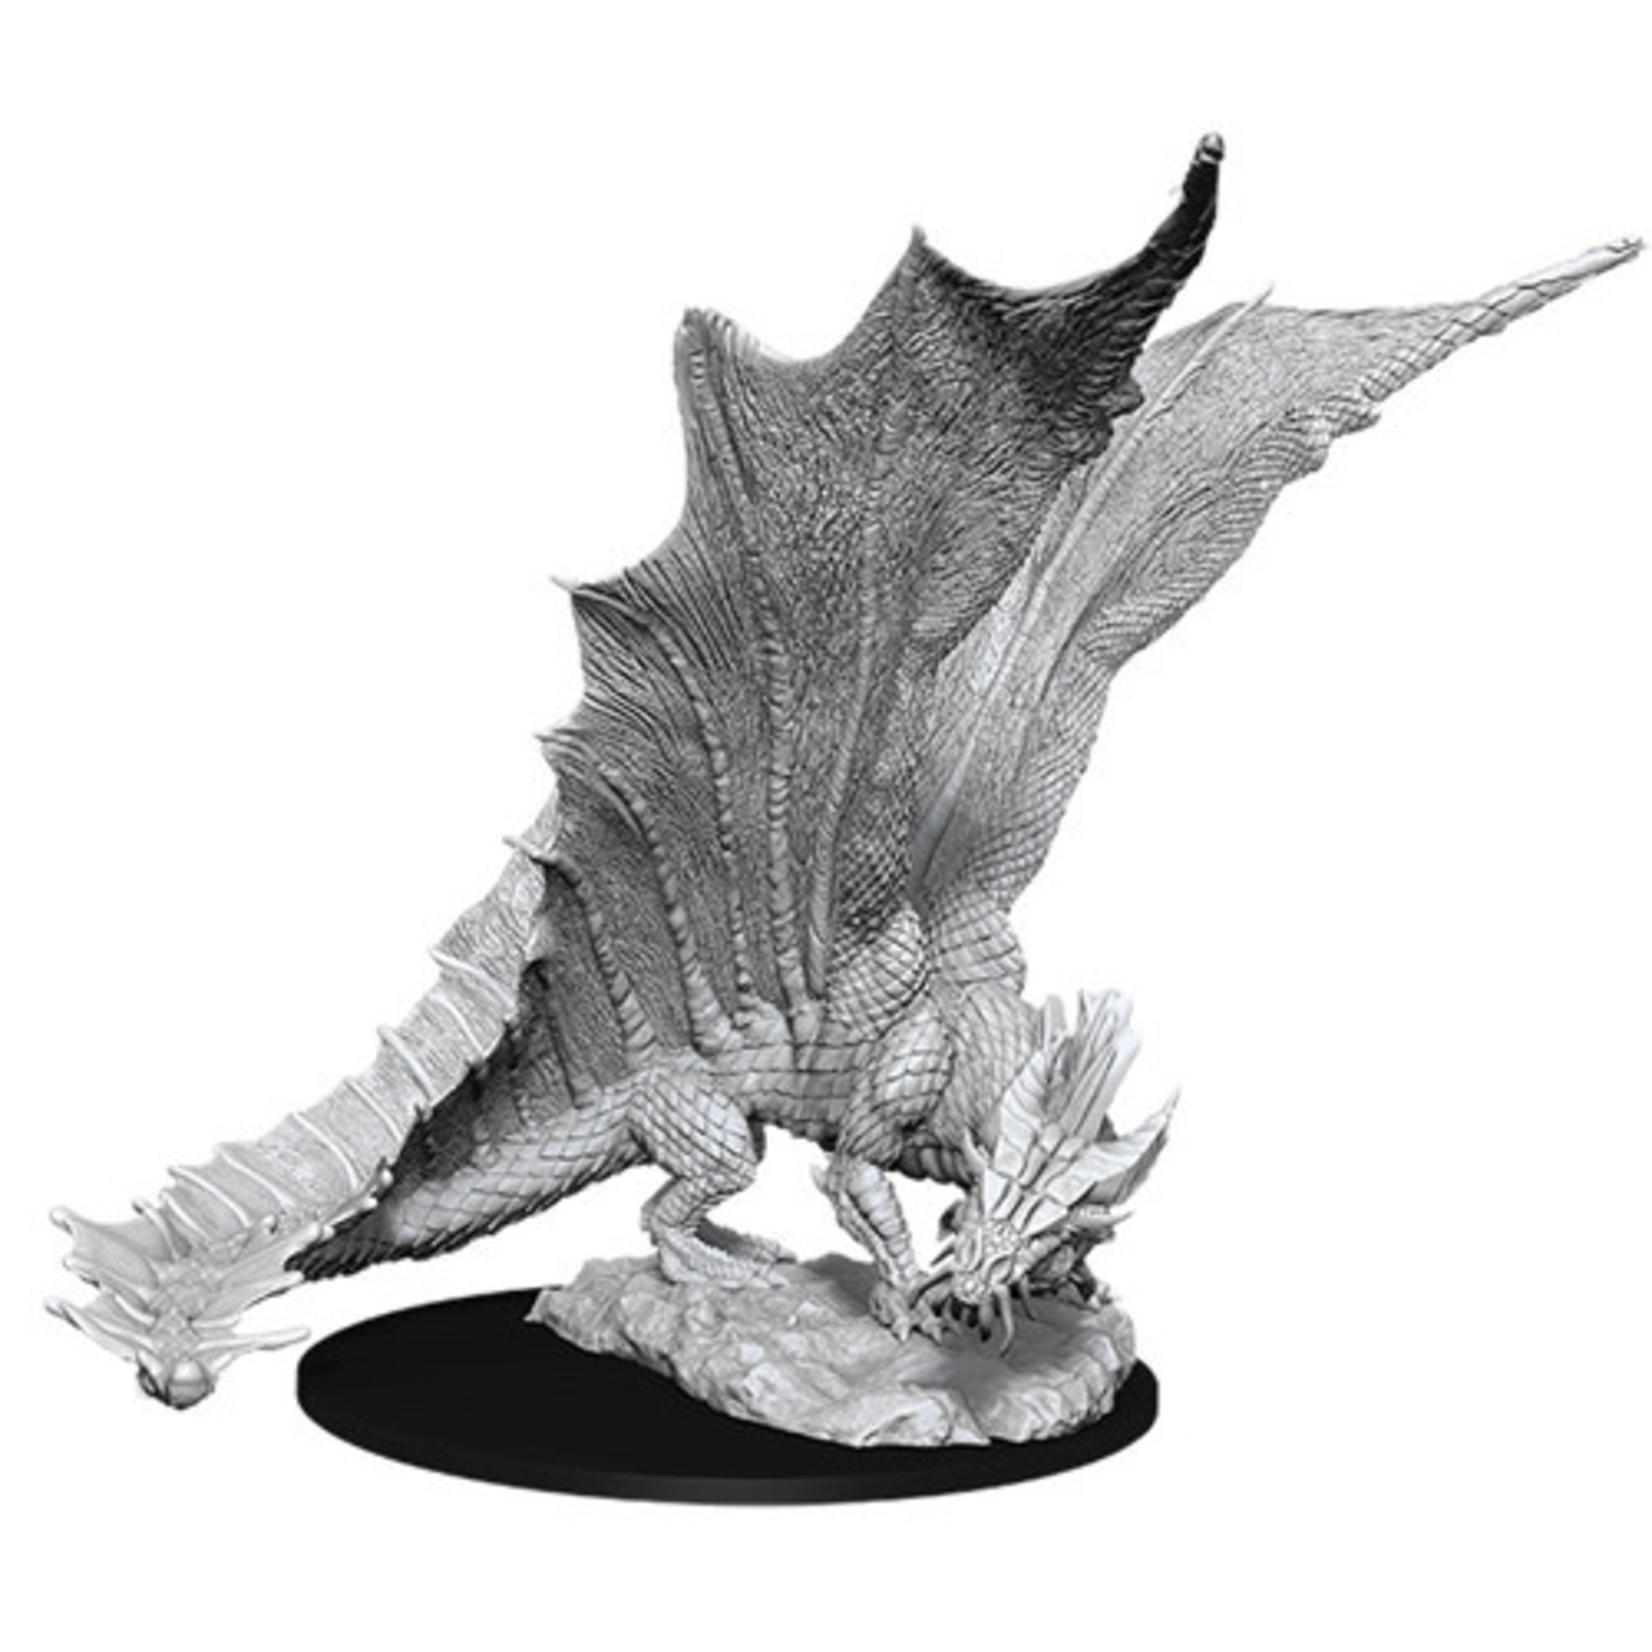 WizKids/Neca 90034 Nolzur's Young Gold Dragon